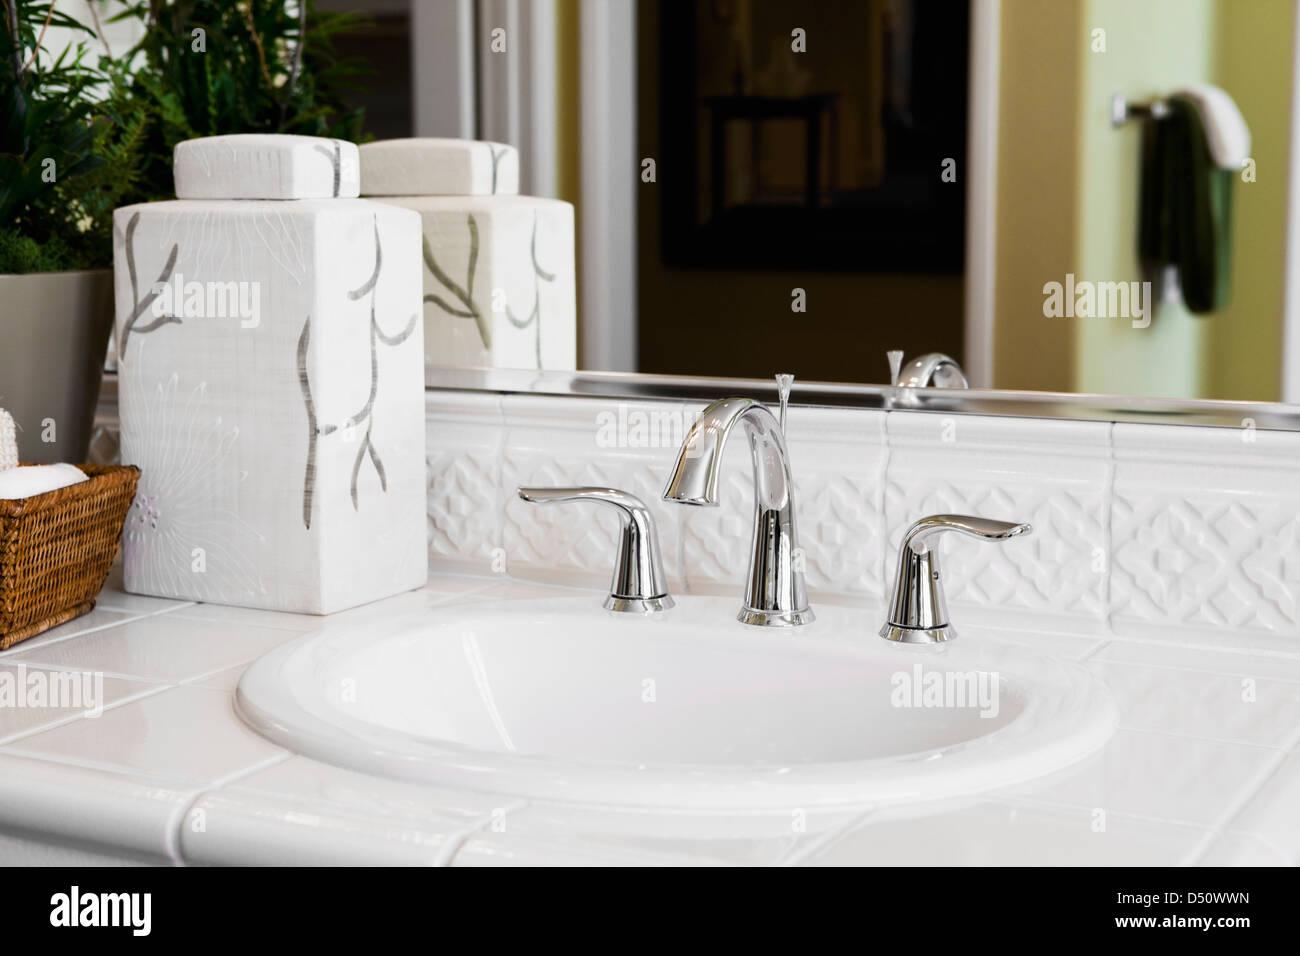 https www alamy com stock photo white tile countertop surrounding bathroom sink tustin california 54724705 html